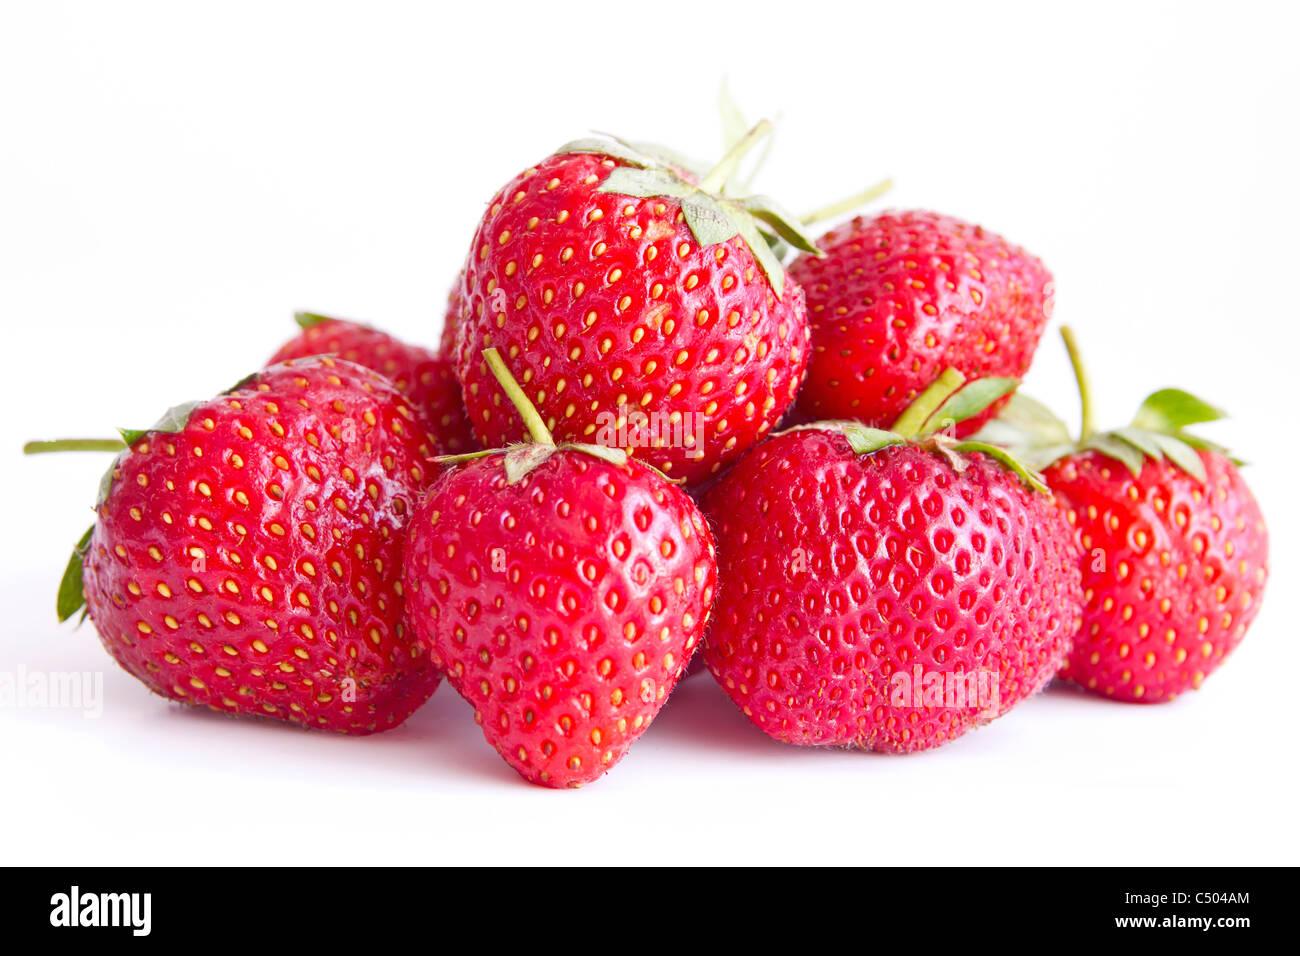 Strawberry Photo Stock